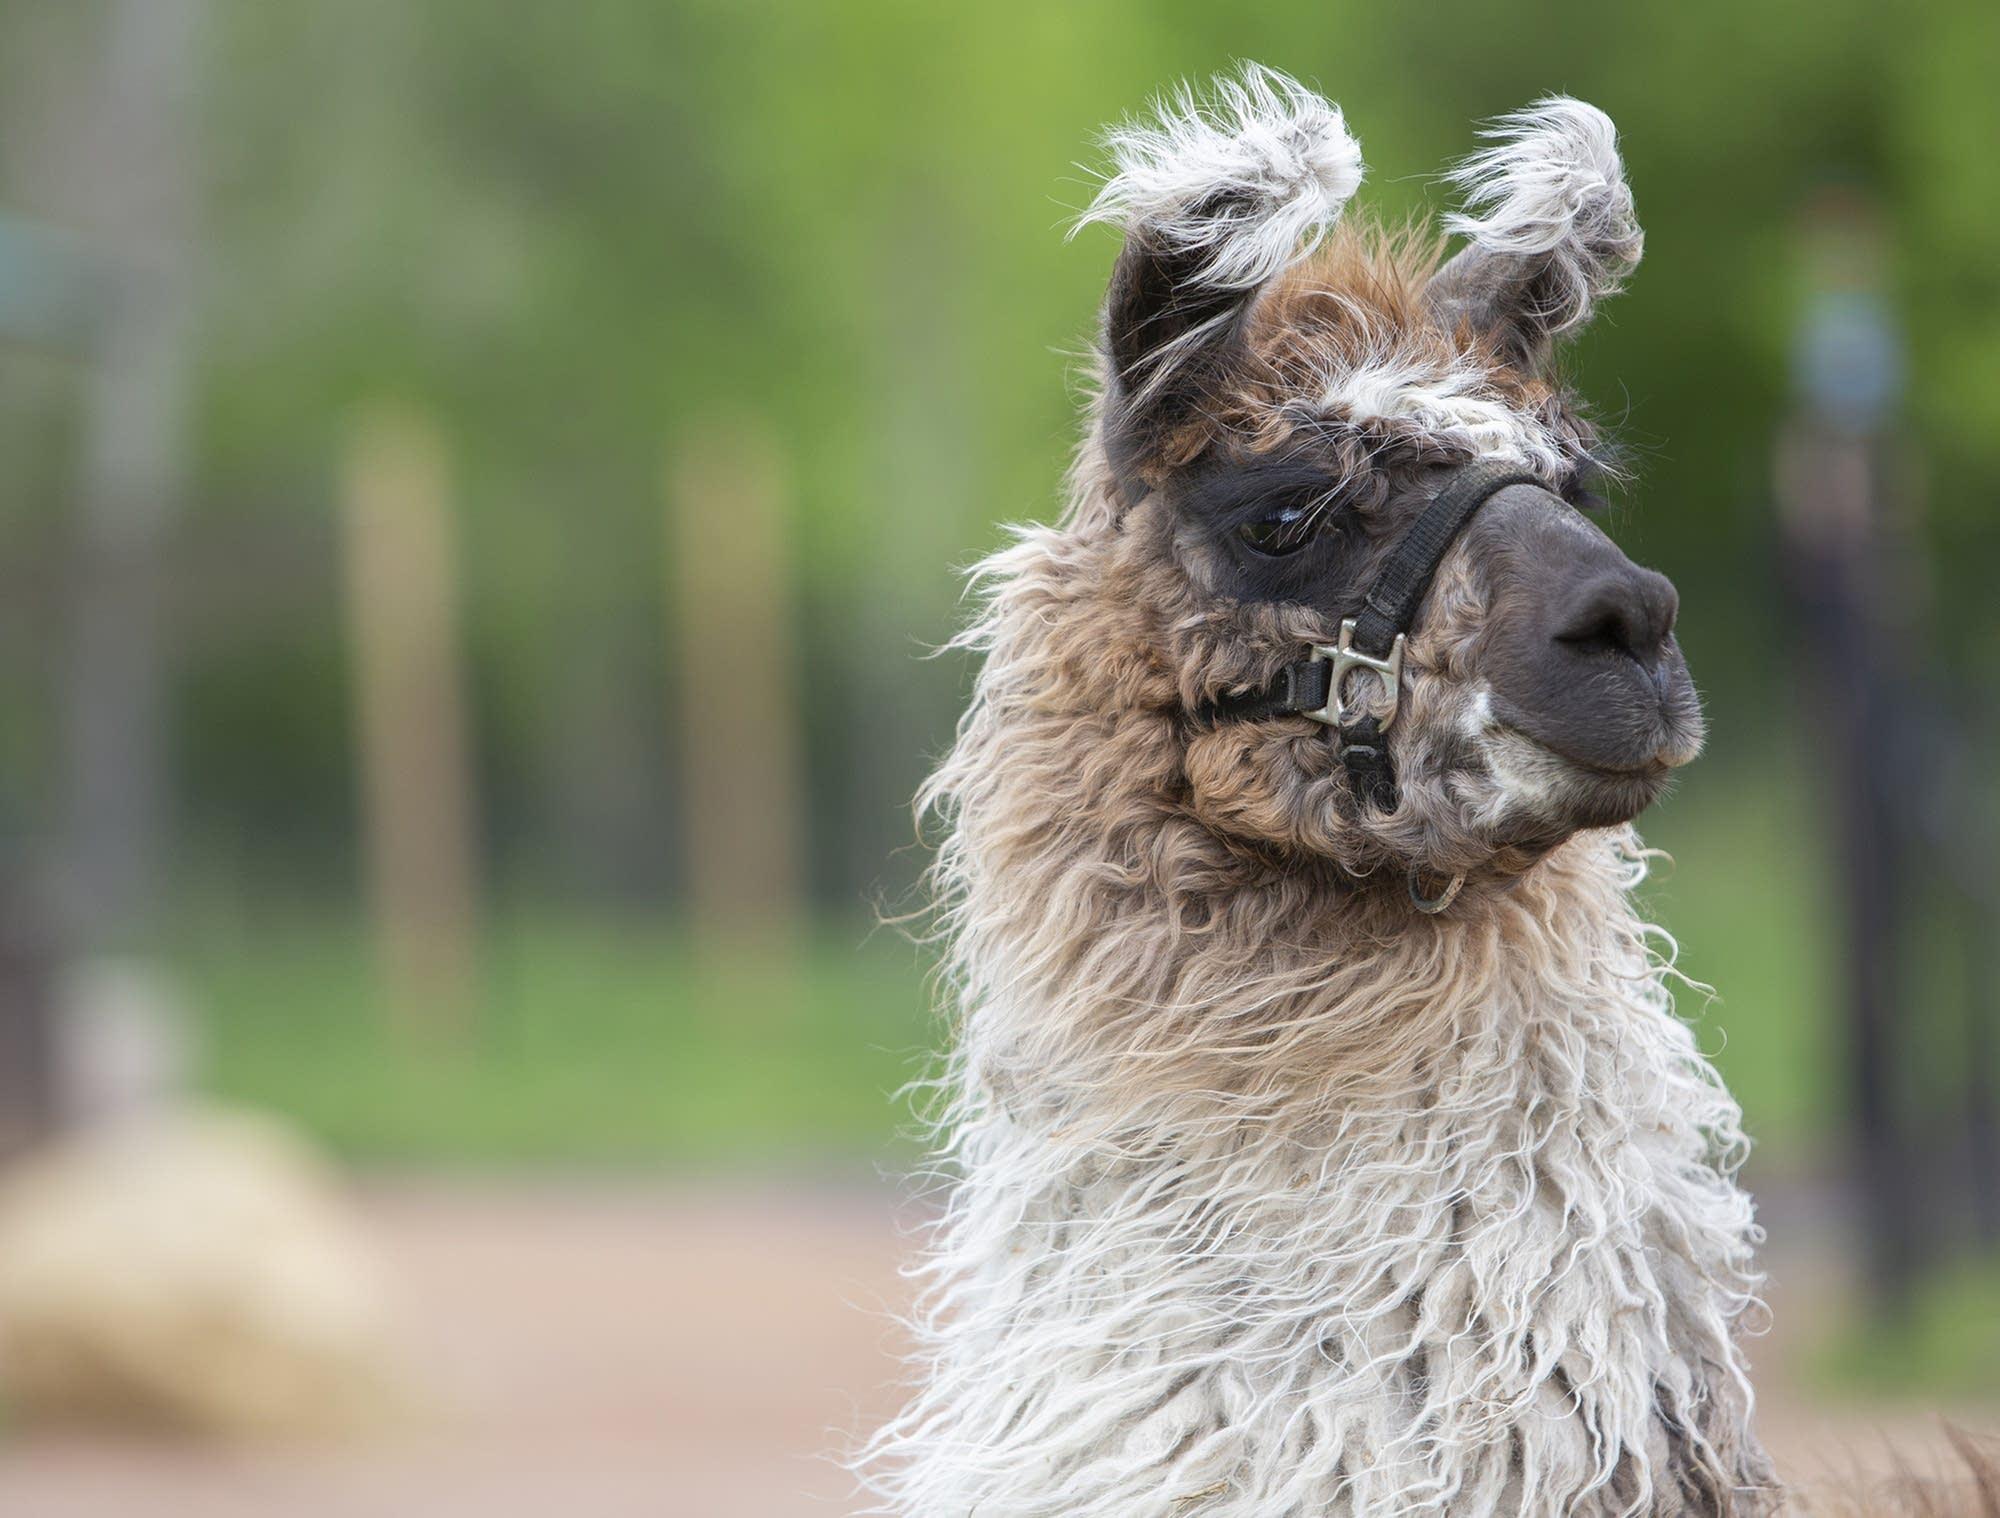 The 20 llamas are on loan from Carlson's Loveable Llamas in Waconia.